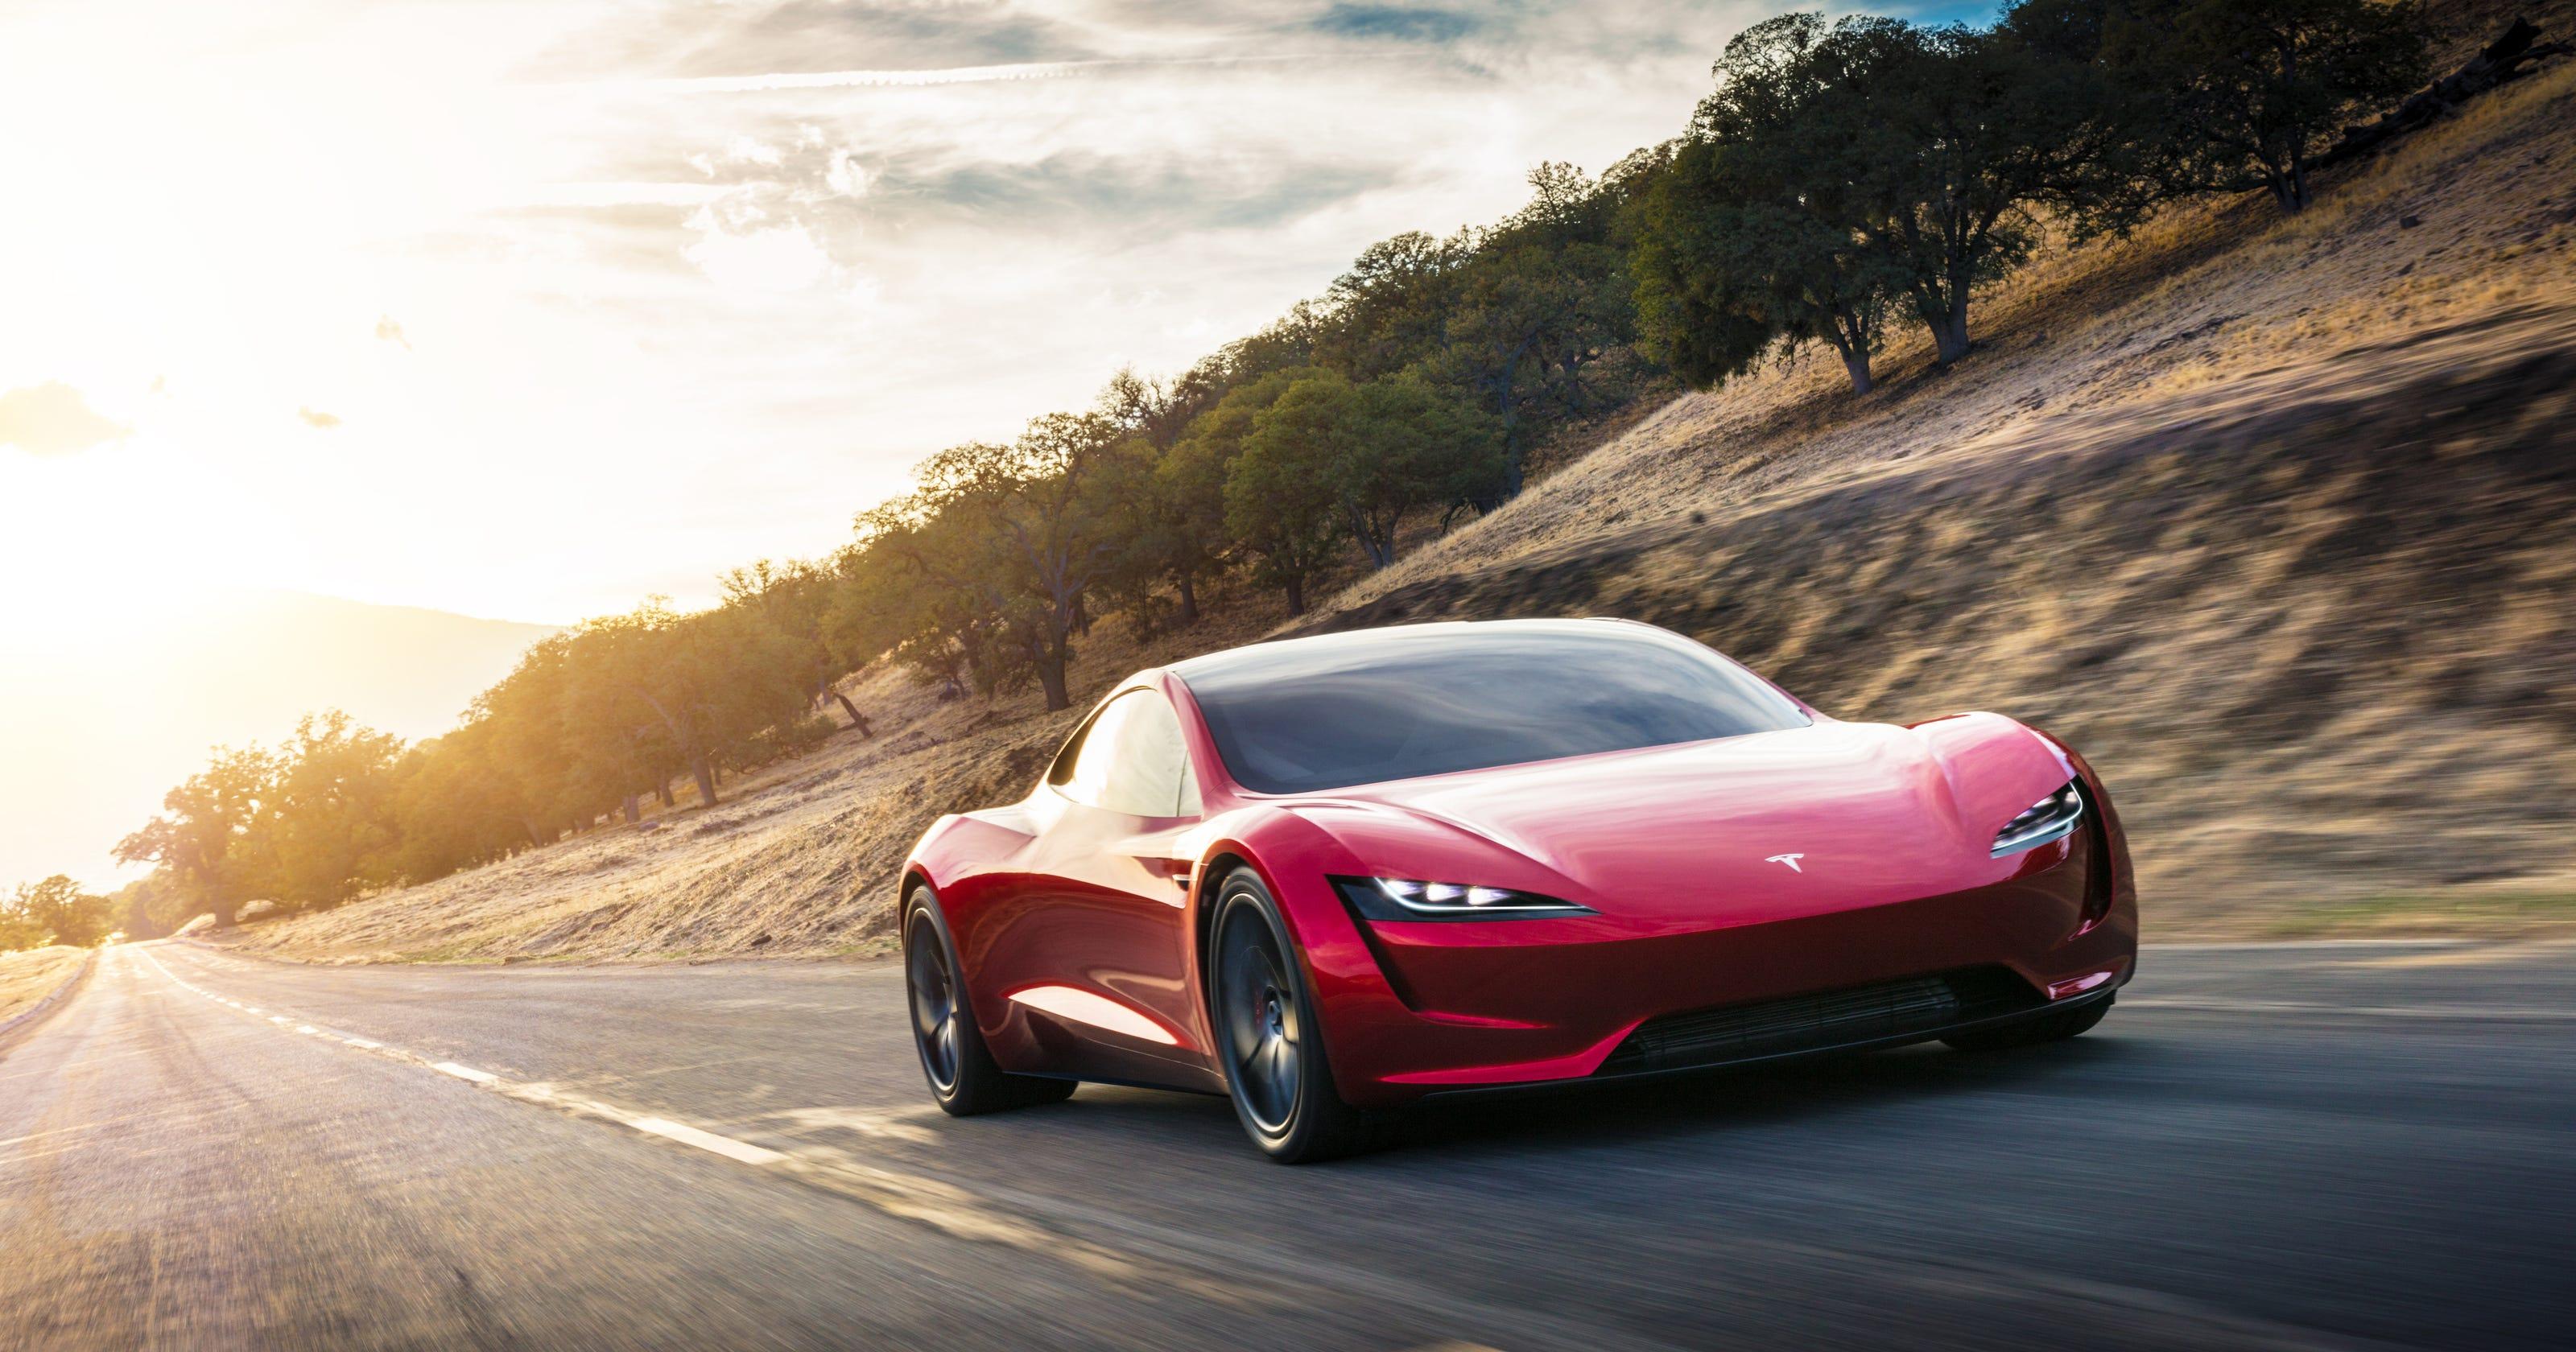 Tesla flying car? Elon Musk teases 'special upgrade' of Roadster